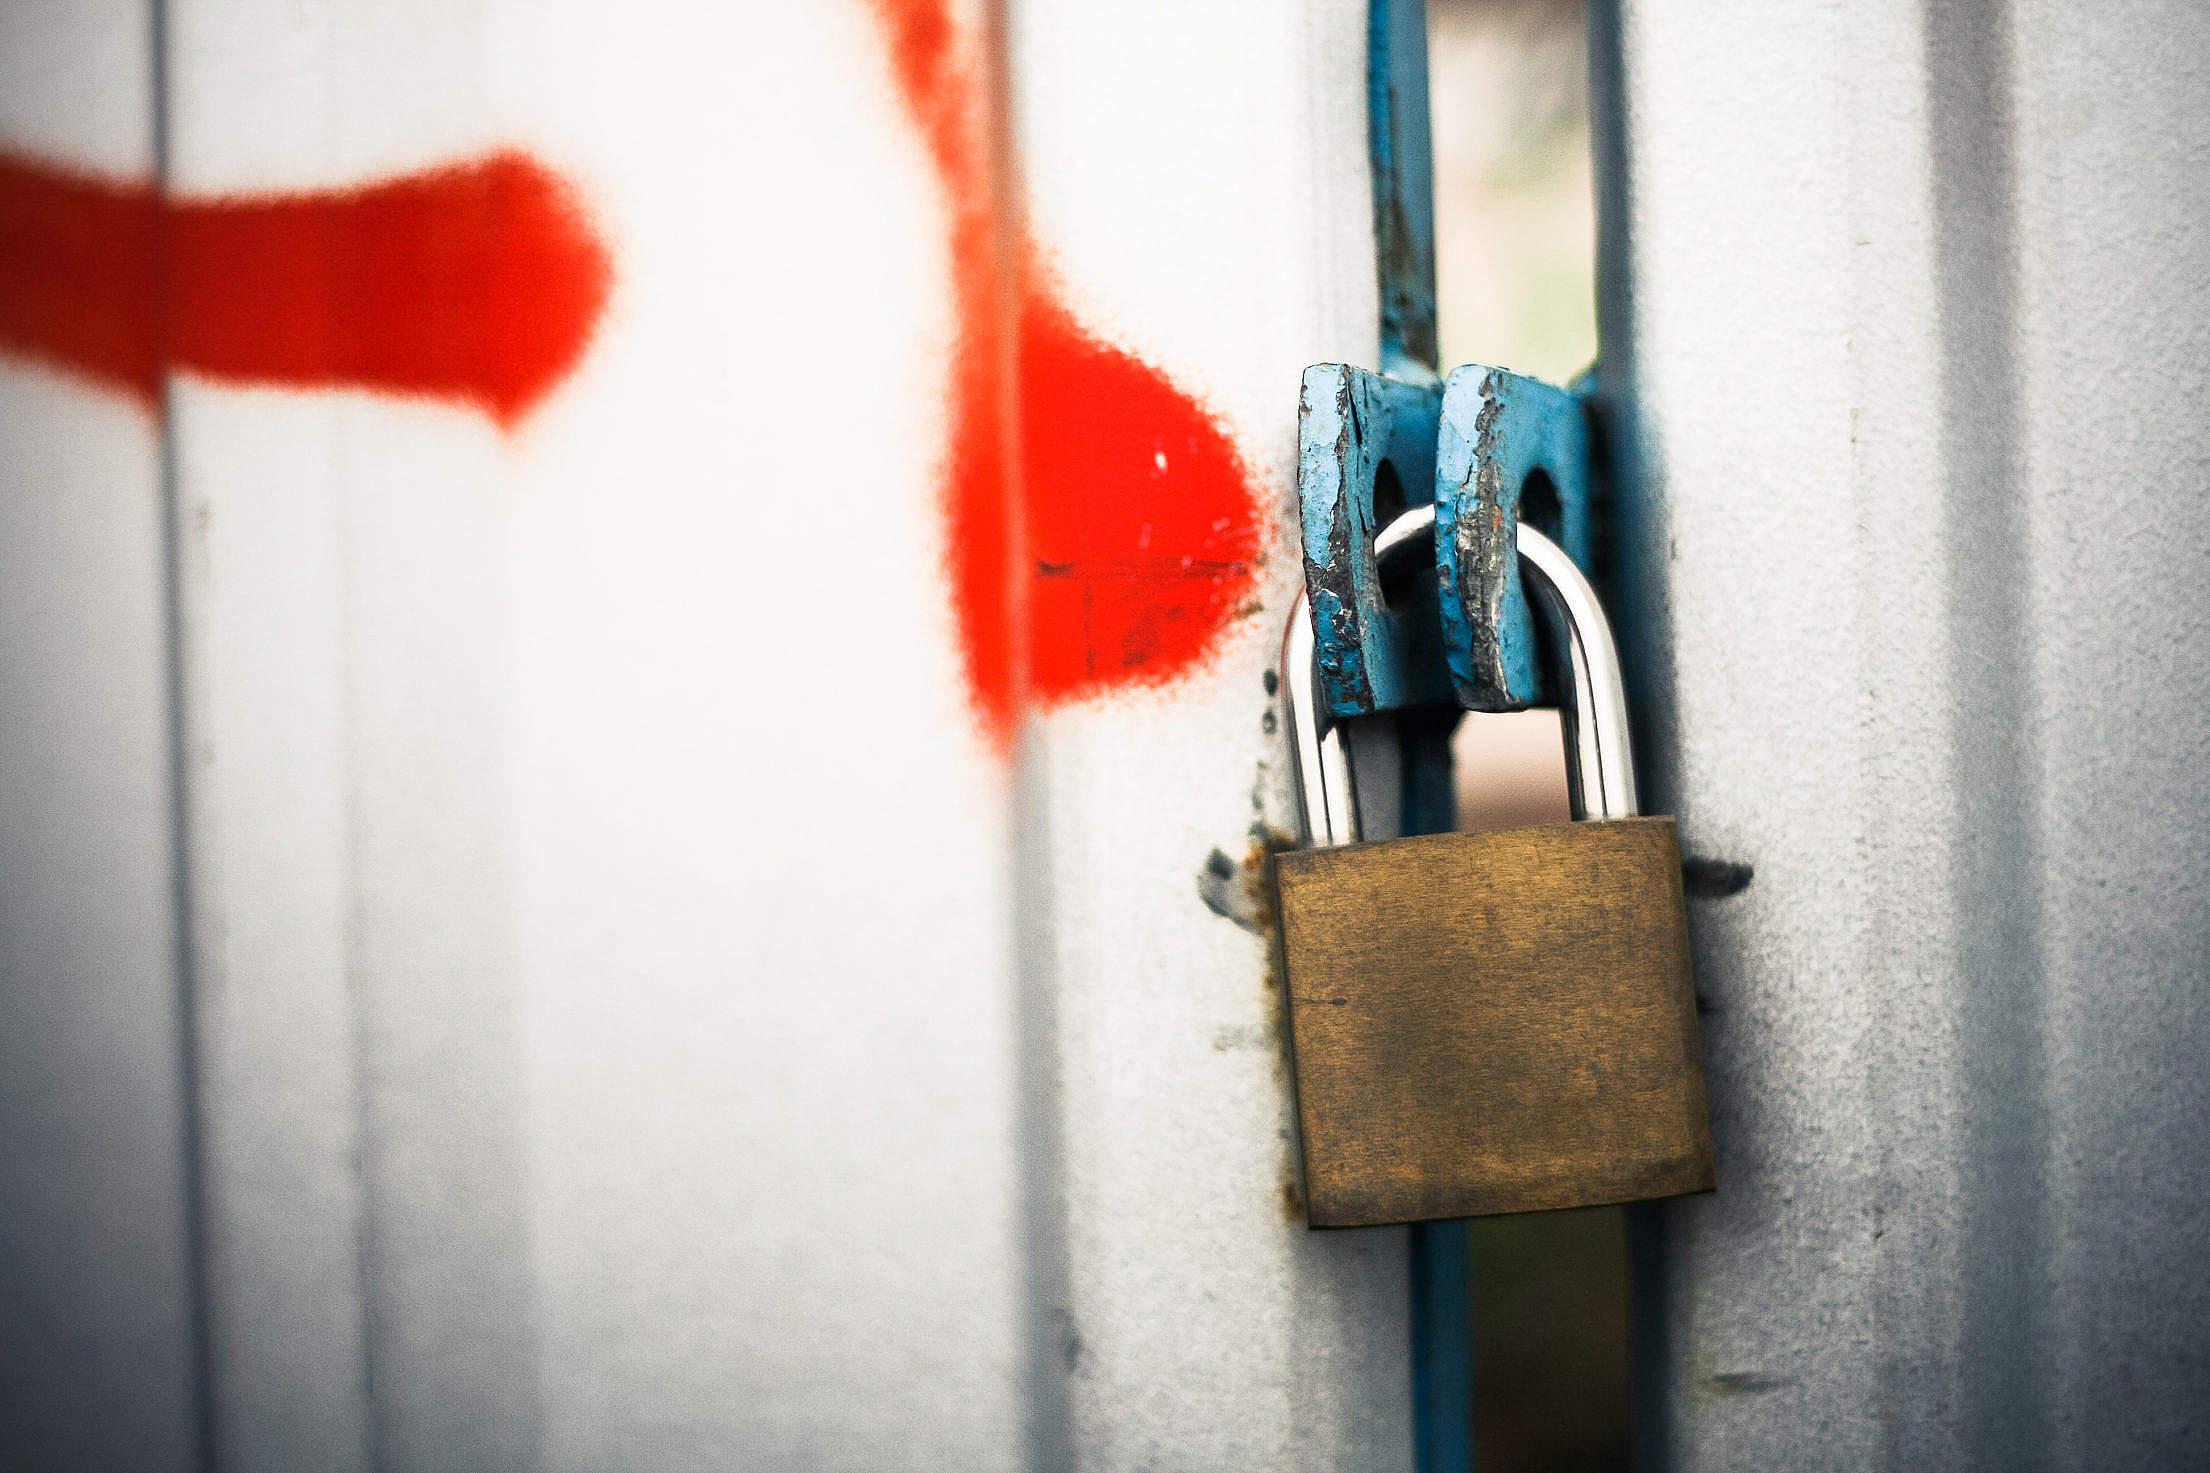 Locked Steel Gate Free Stock Photo